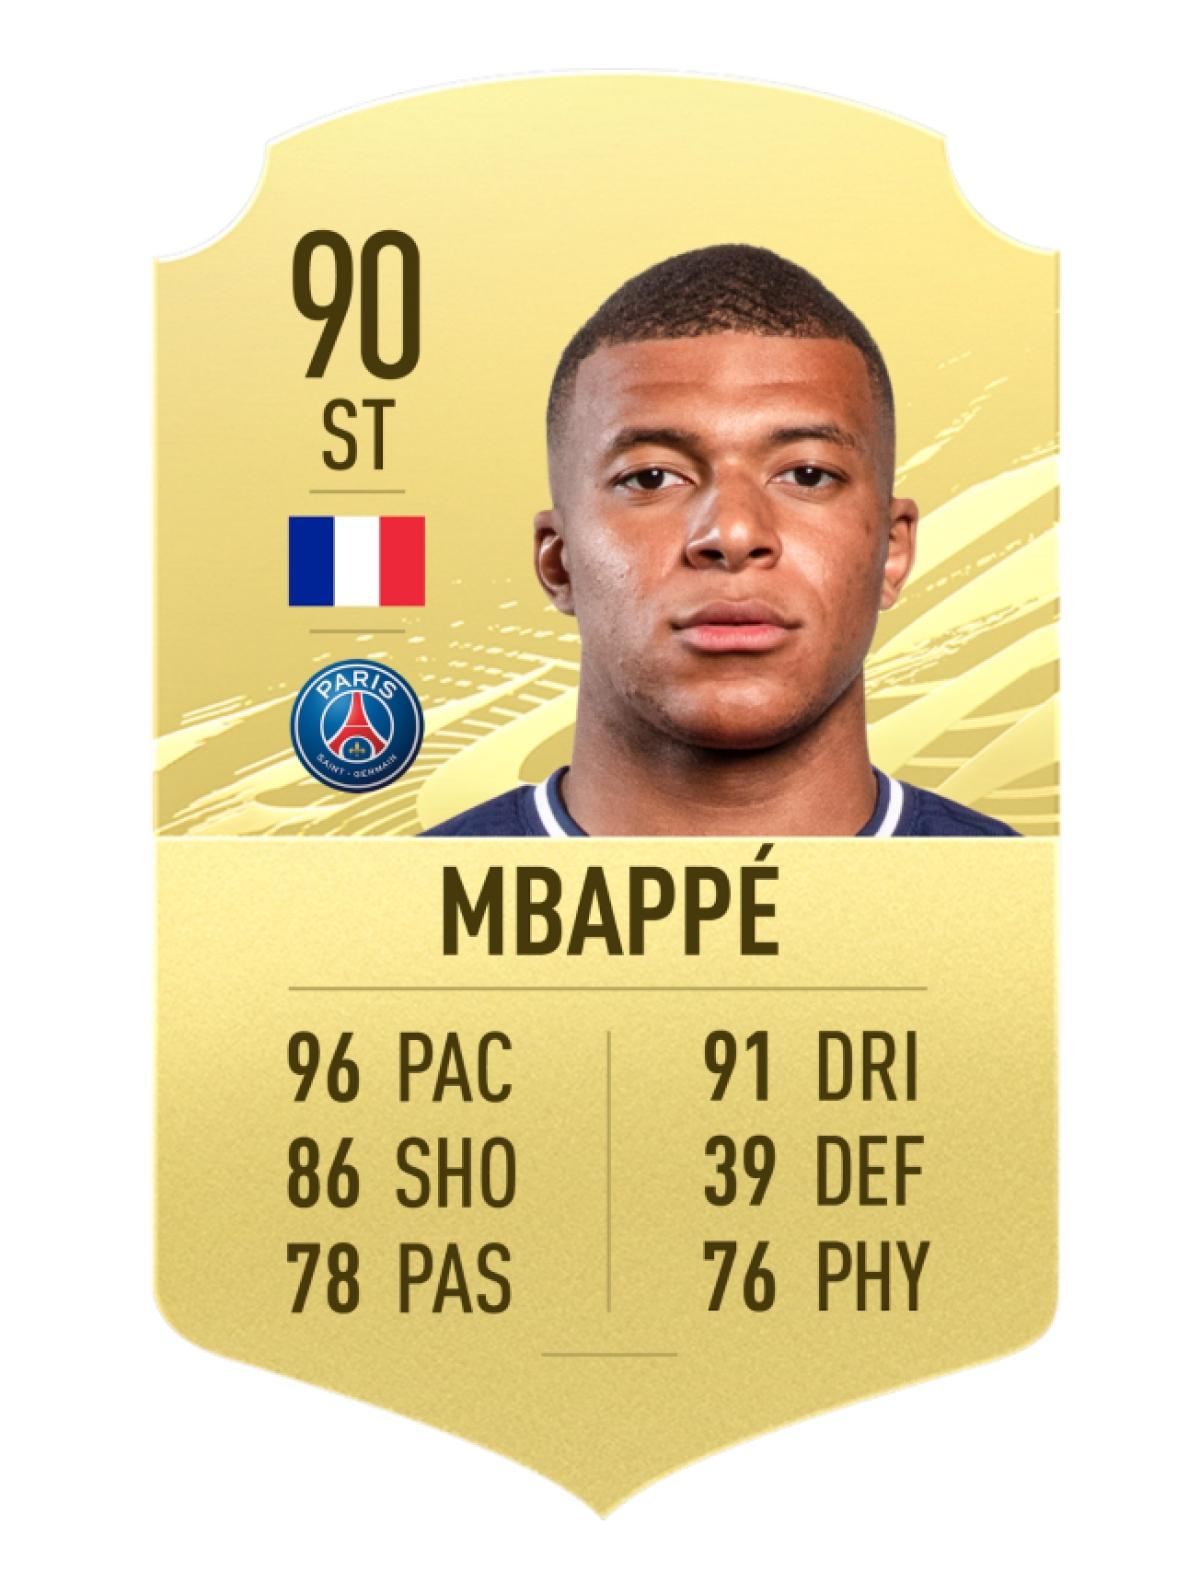 5. Kylian Mbappé - Paris Saint-Germain | Chỉ số rê bóng 91